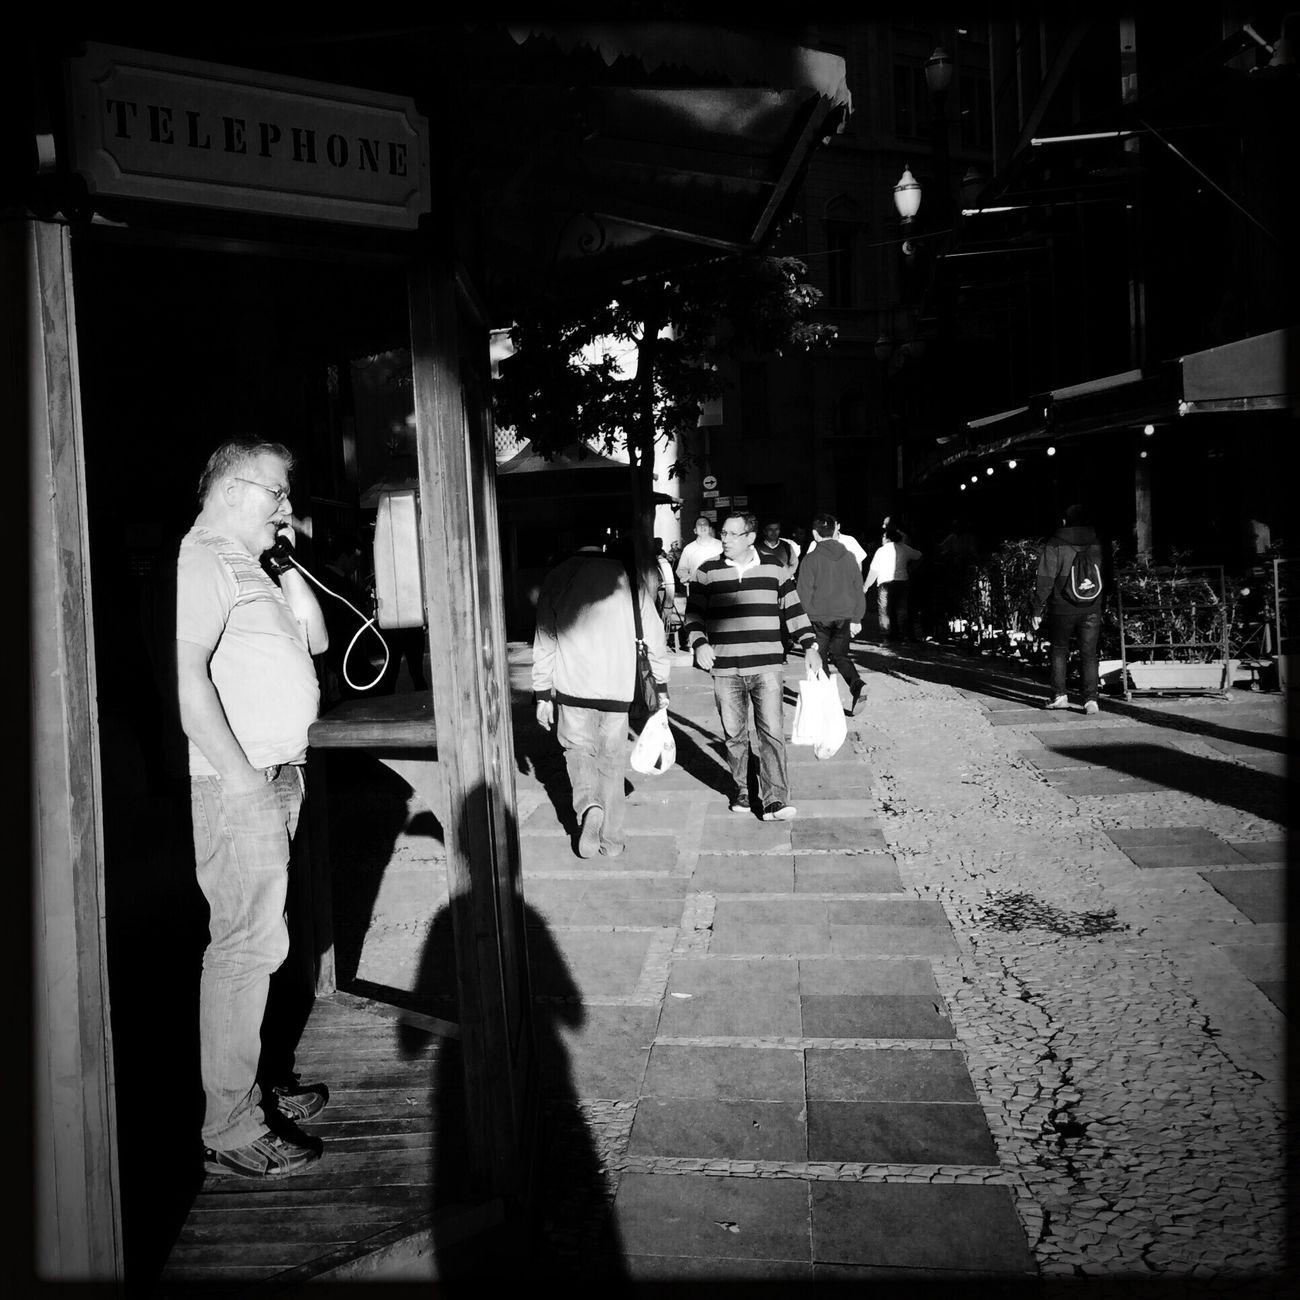 Street Photography Fotografia De Rua Fotografía Urbana